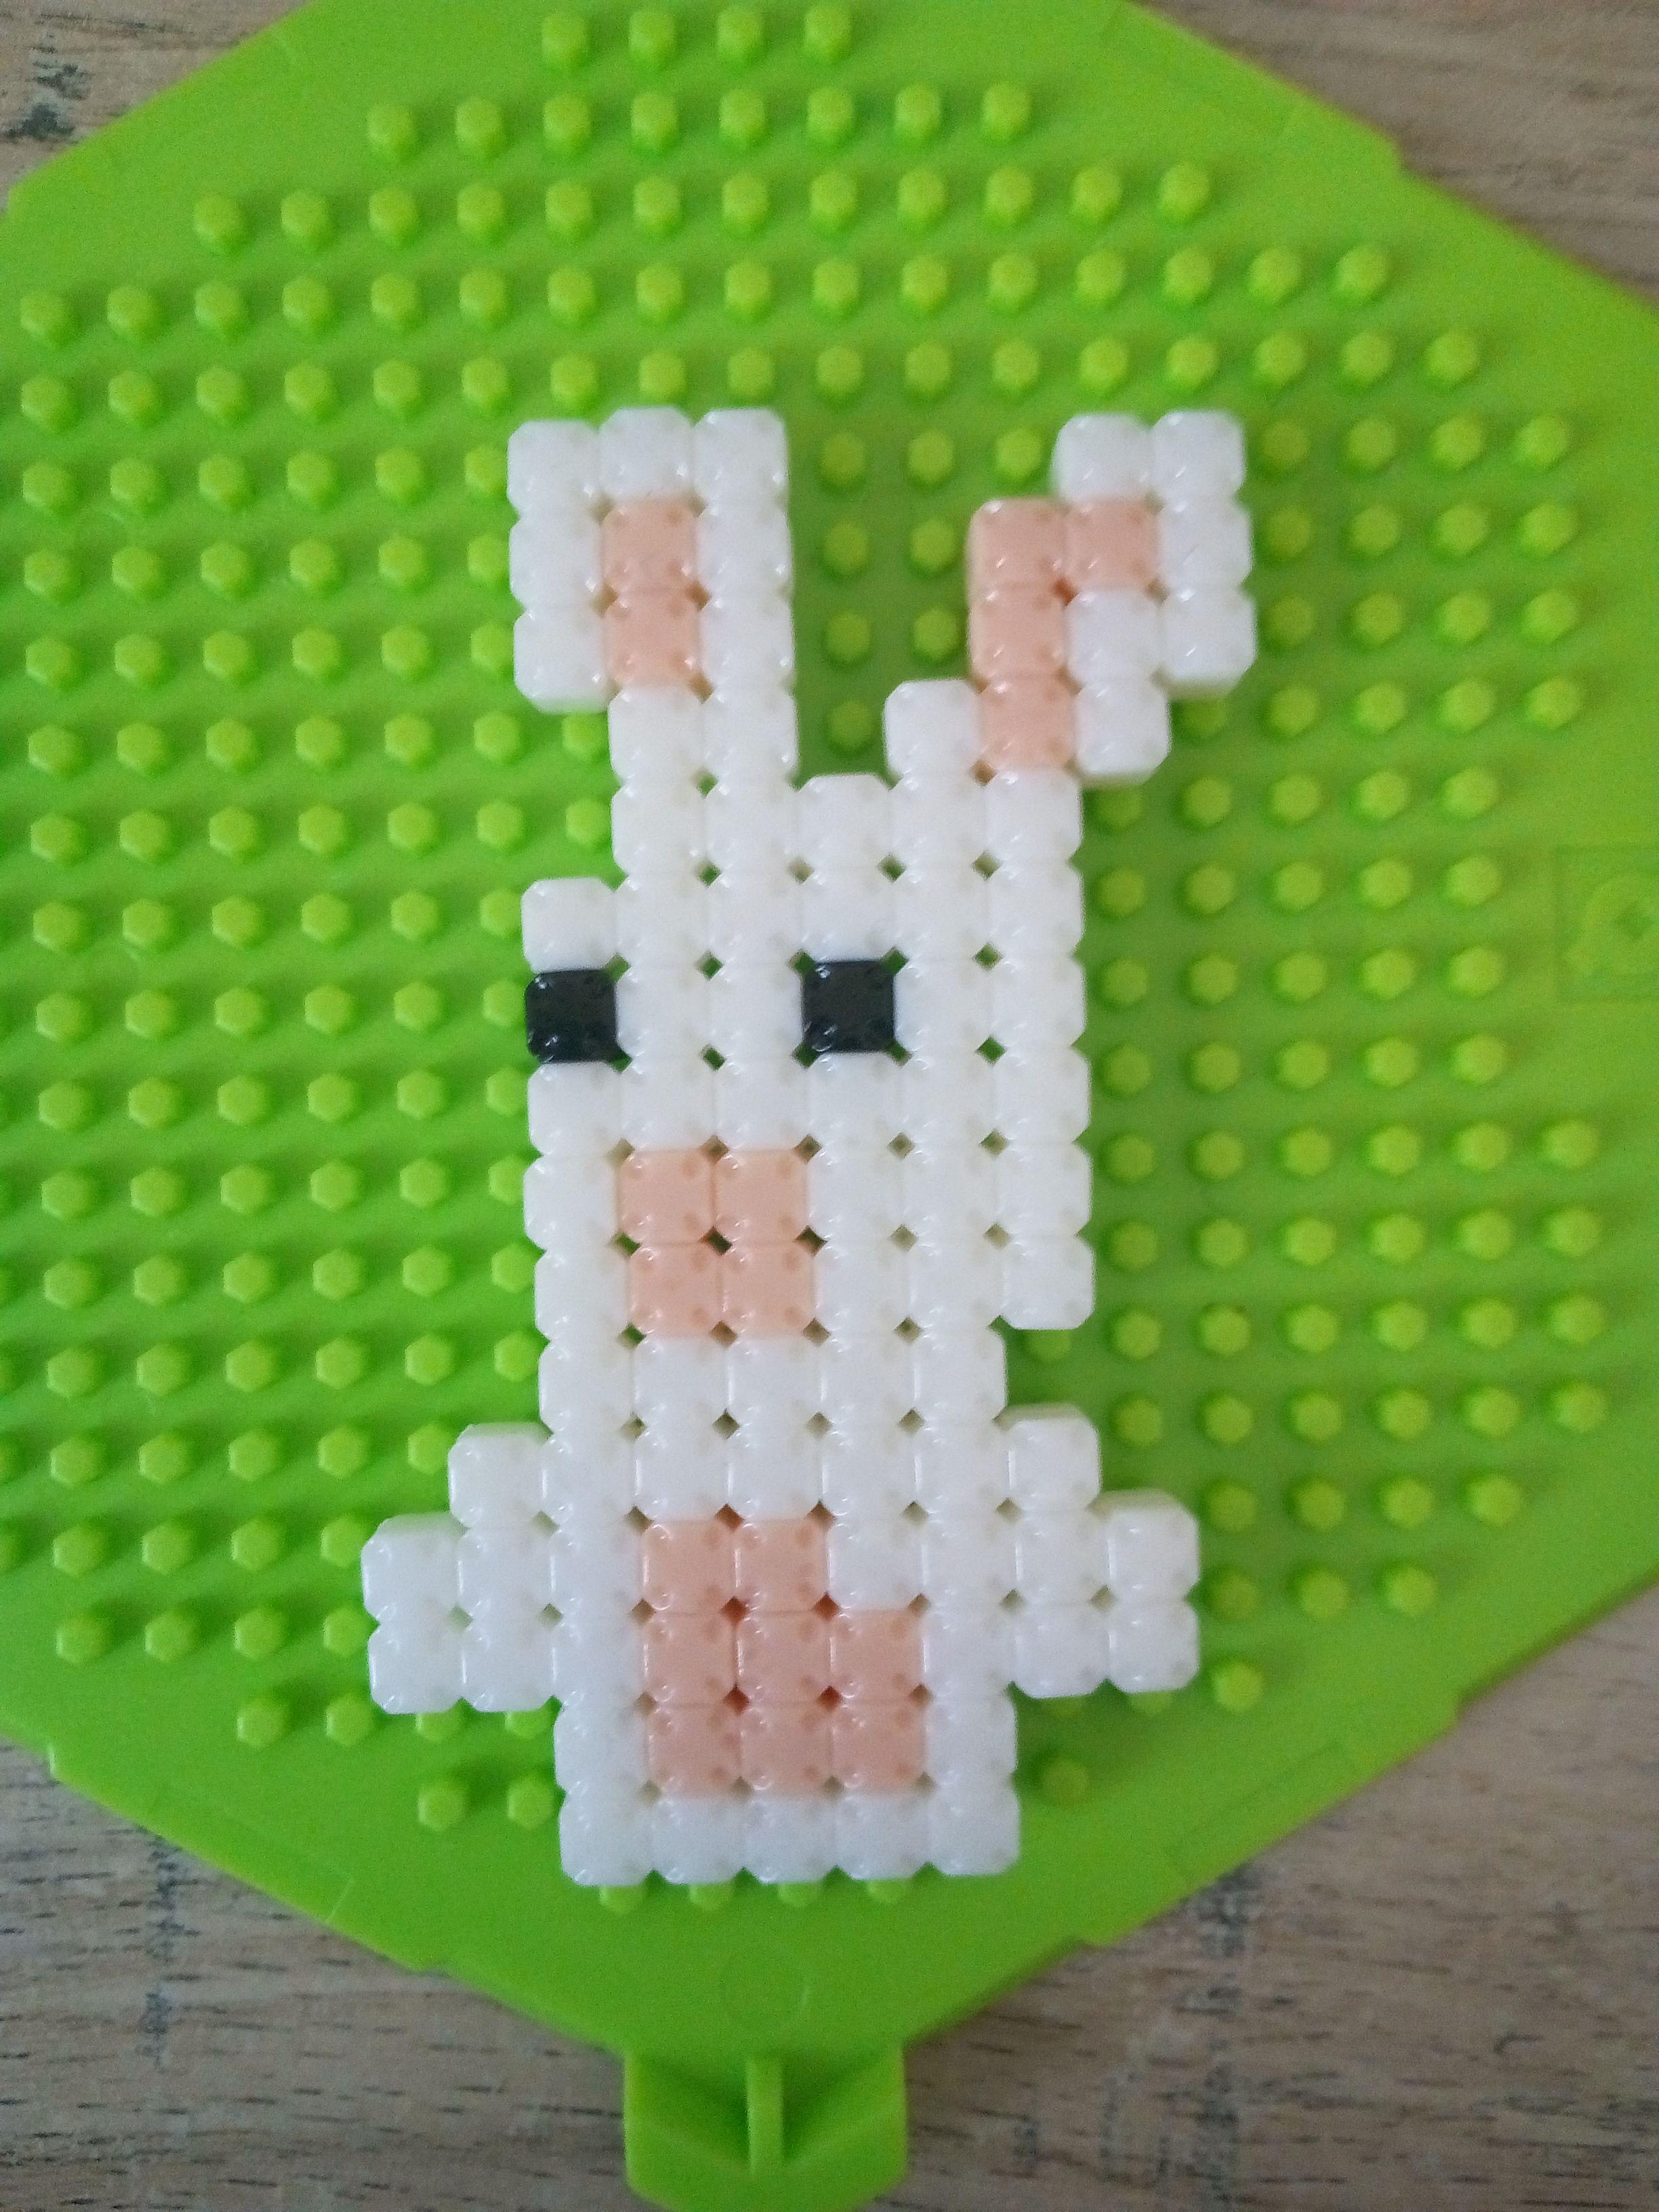 Lapin Cretin Activite Enfant Dessin Pixel Lapin Cretin